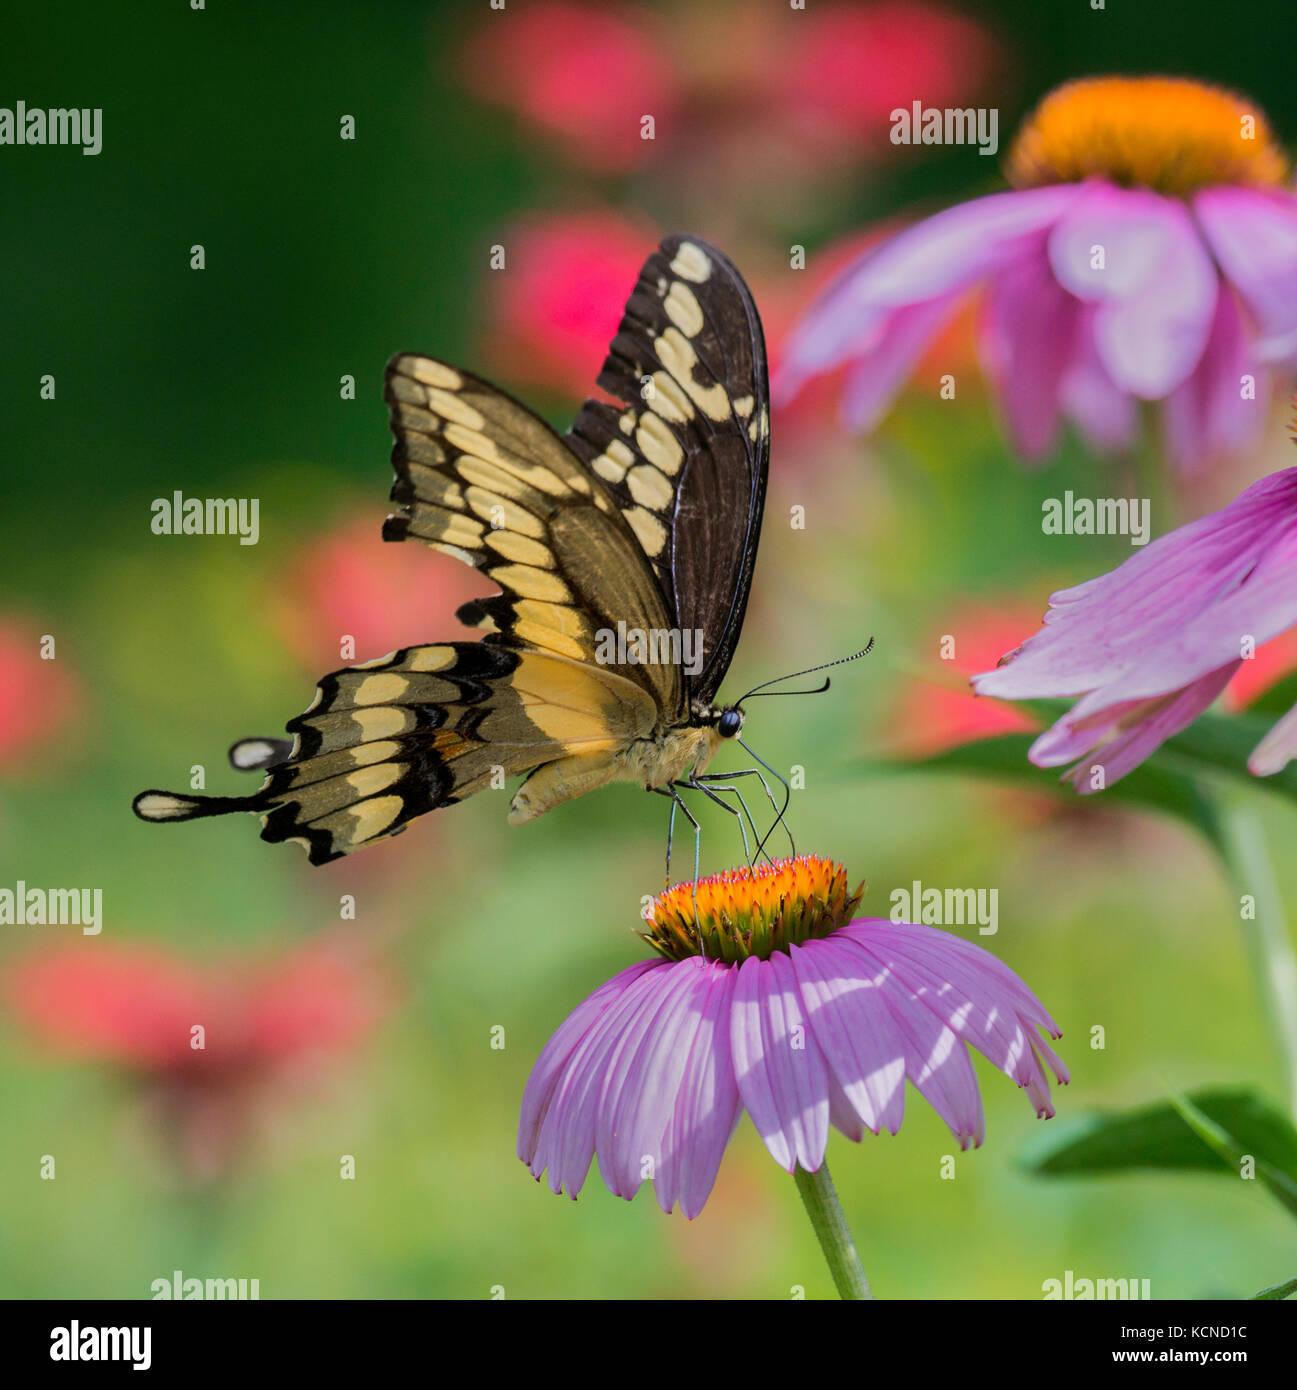 Especie gigante mariposa papilio cresphontes, sobre una flor cónica púrpura, noreste de Ontario, Canadá Foto de stock